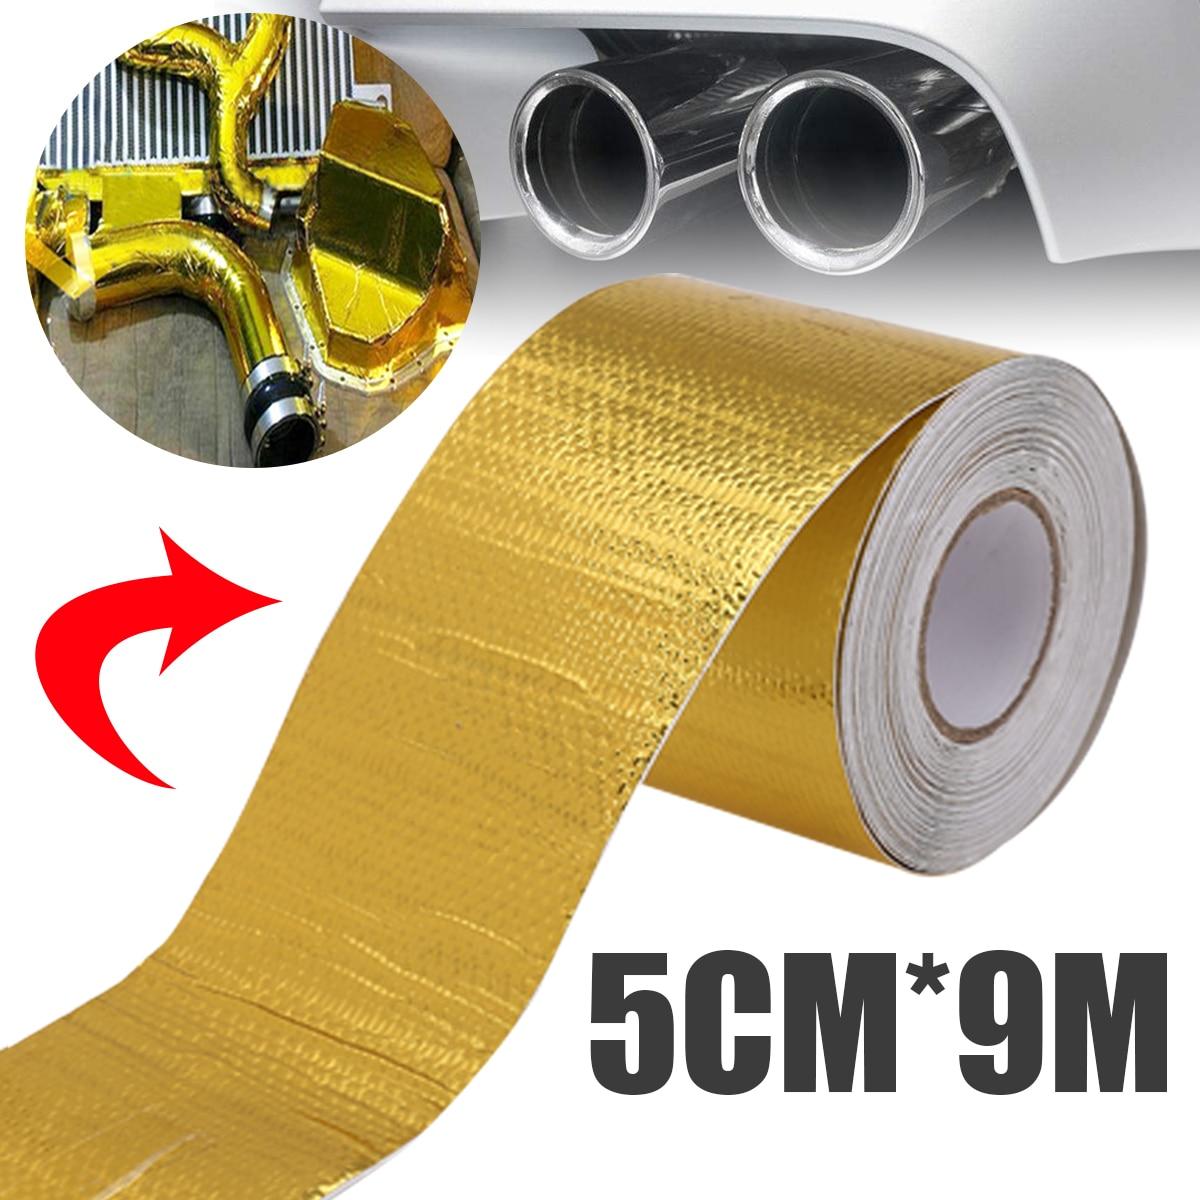 1 Roll 5CM*9M Self-Adhesive Heat Reflective Tape Car Truck Motorcycle Fiberglass Shields Reflect Adhesive Wrap Barrier